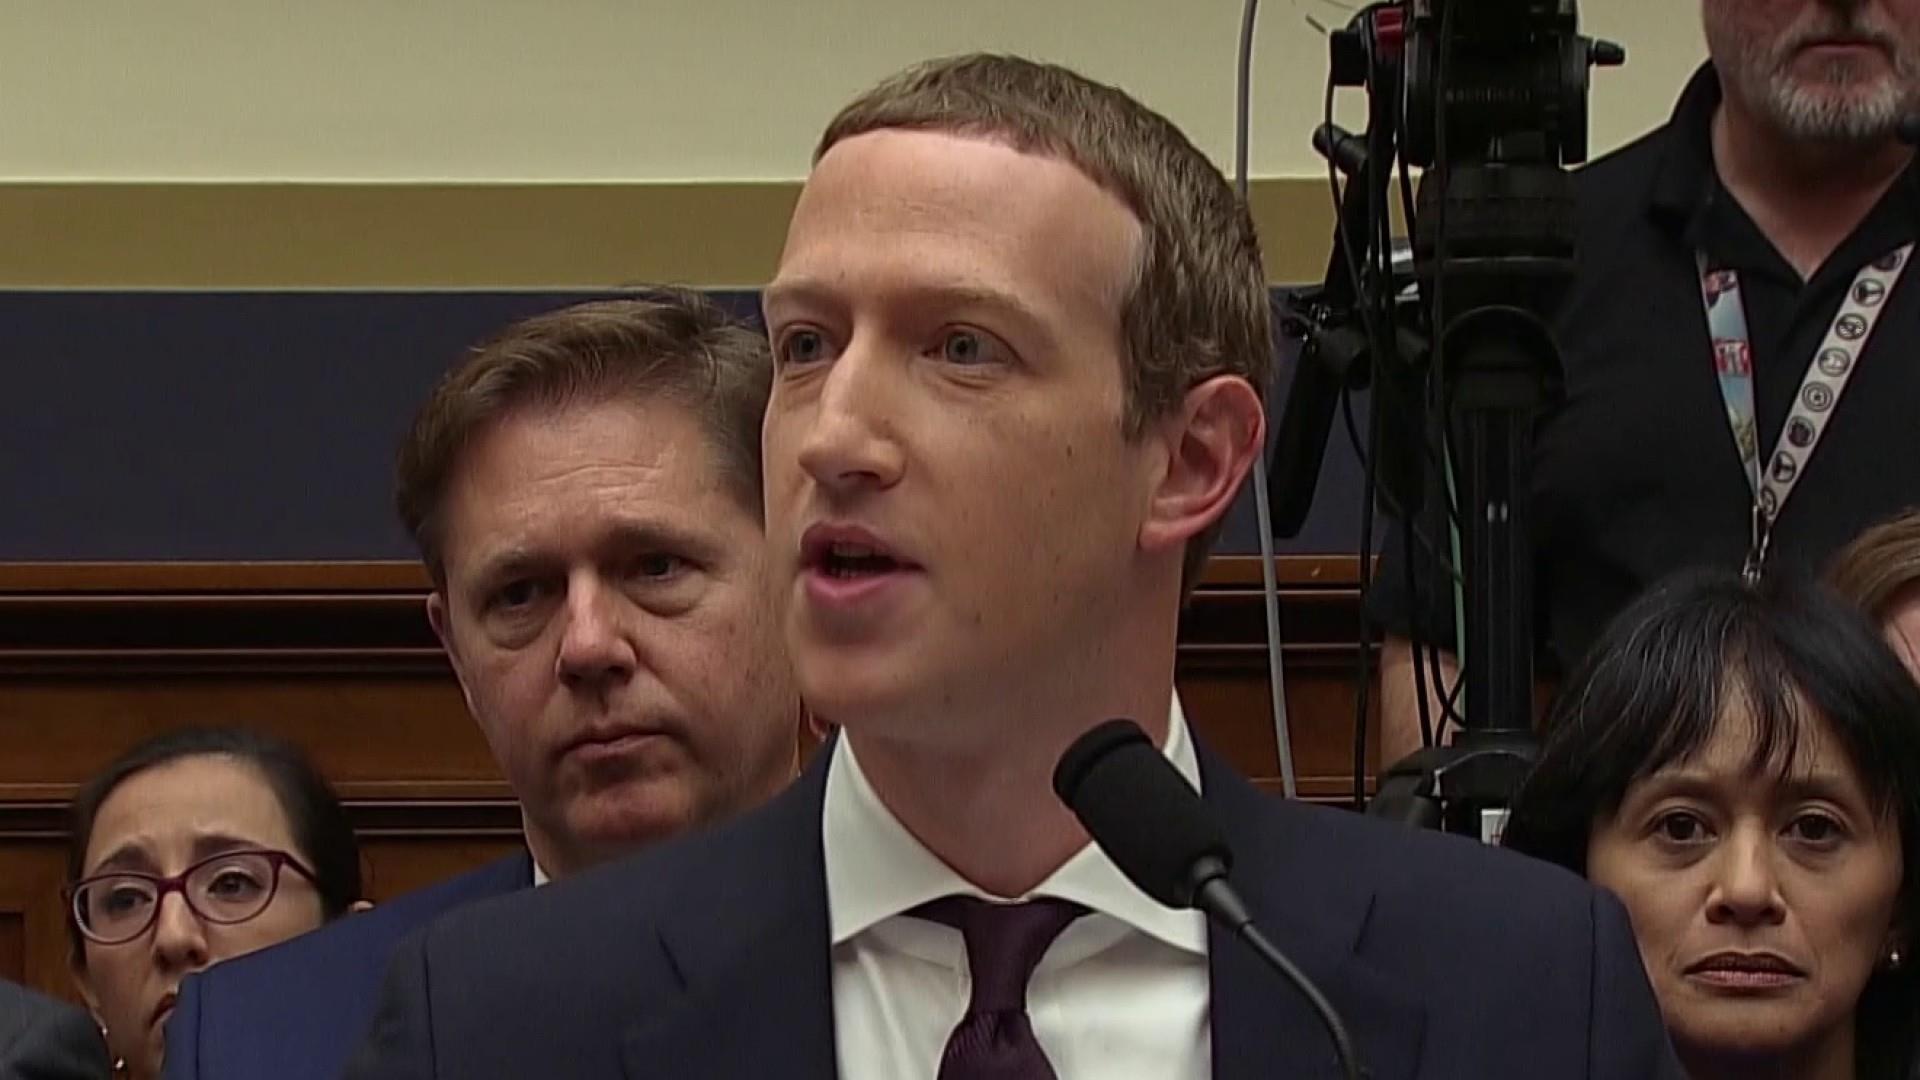 Mark Zuckerberg testifies on Facebook cryptocurrency